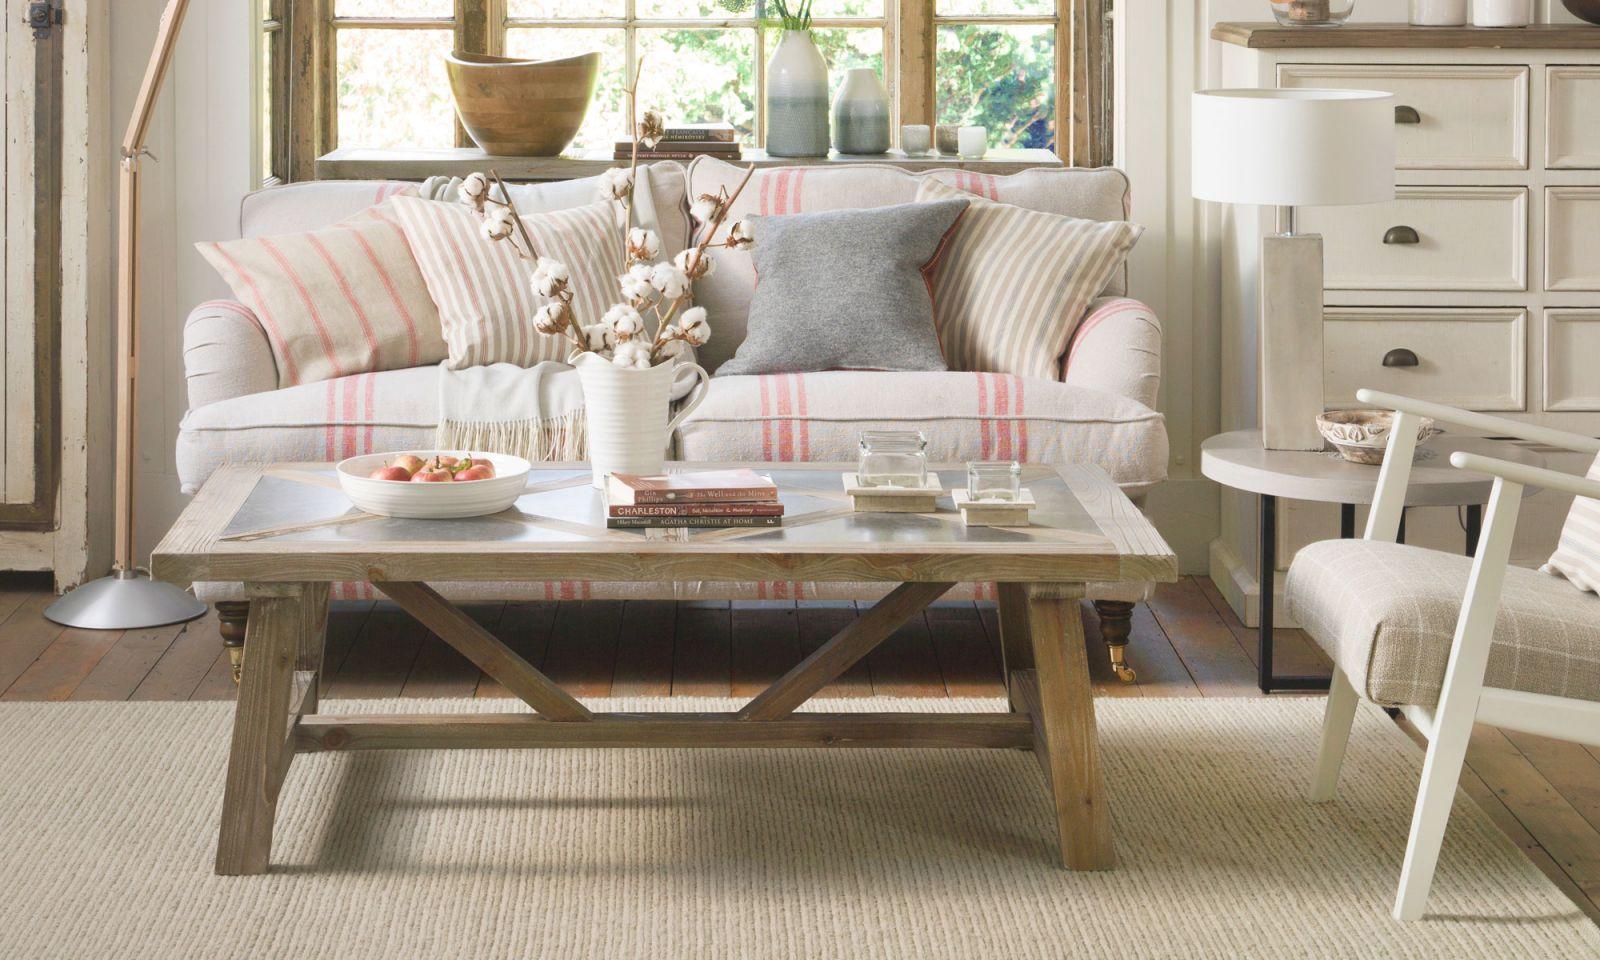 Shabby Chic Decorating Ideas – Shabby Chic Furniture in Shabby Chic Living Room Furniture